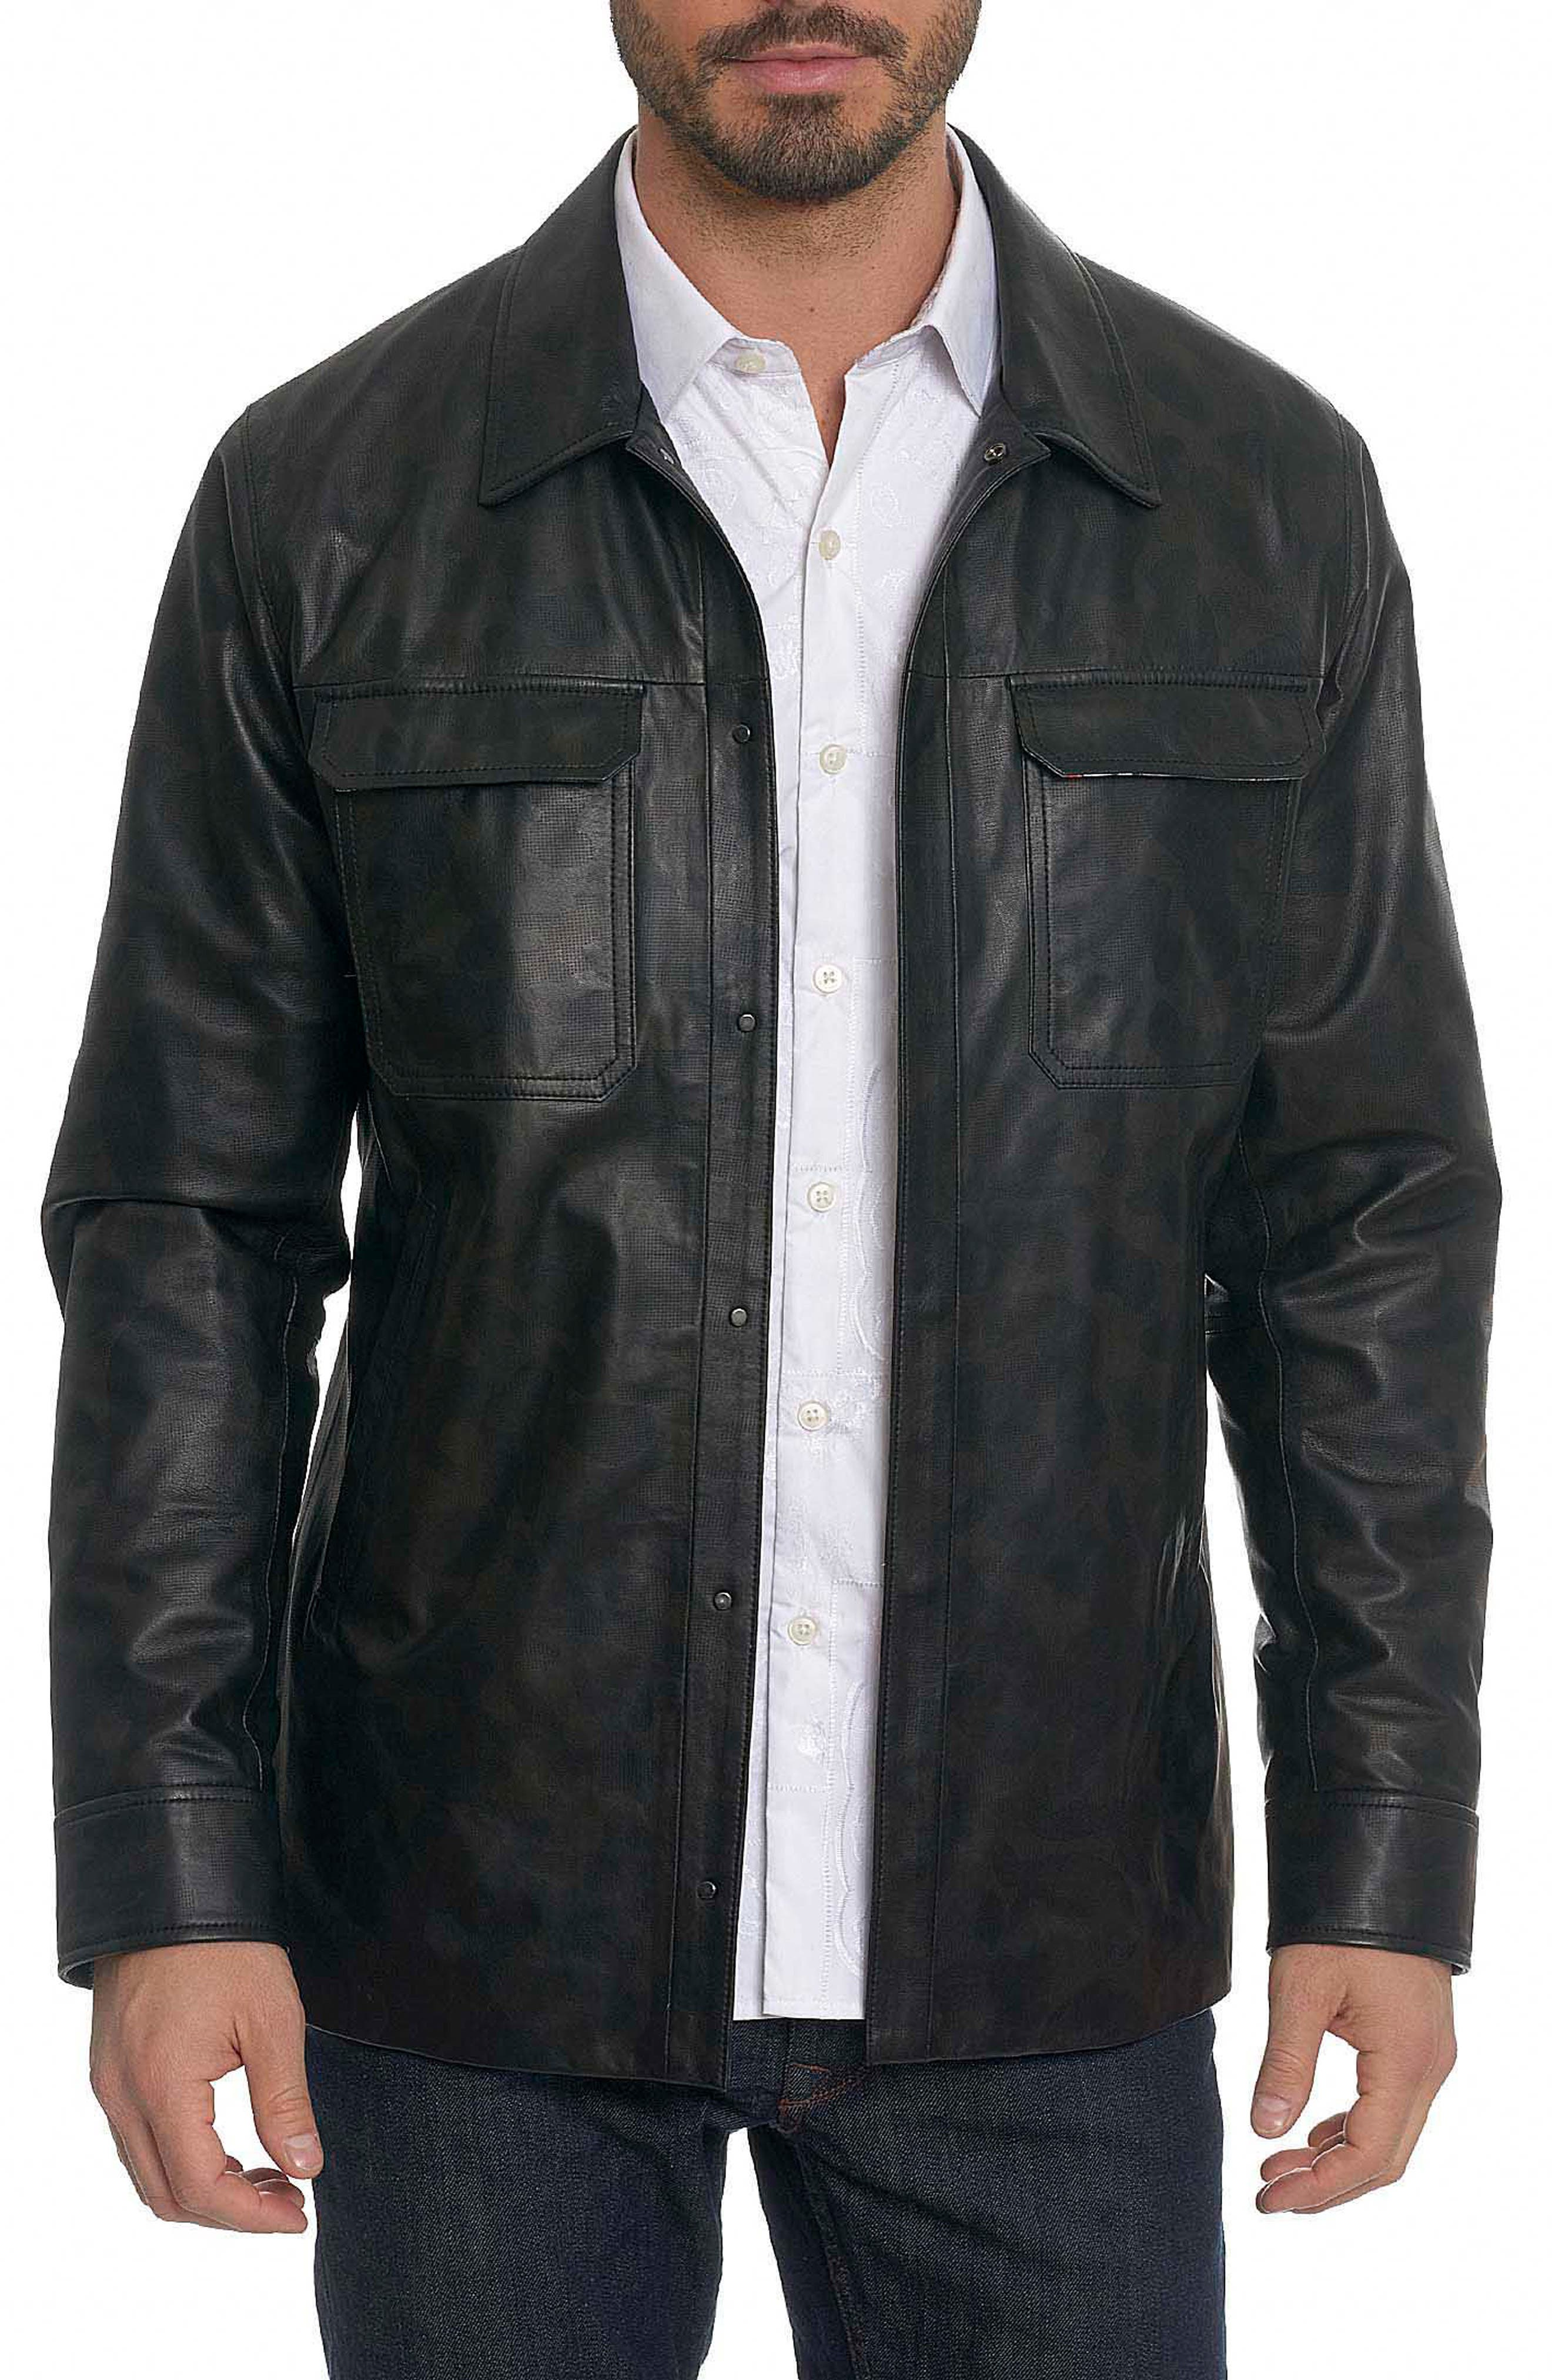 Colden Camo Leather Shirt Jacket,                         Main,                         color, Black